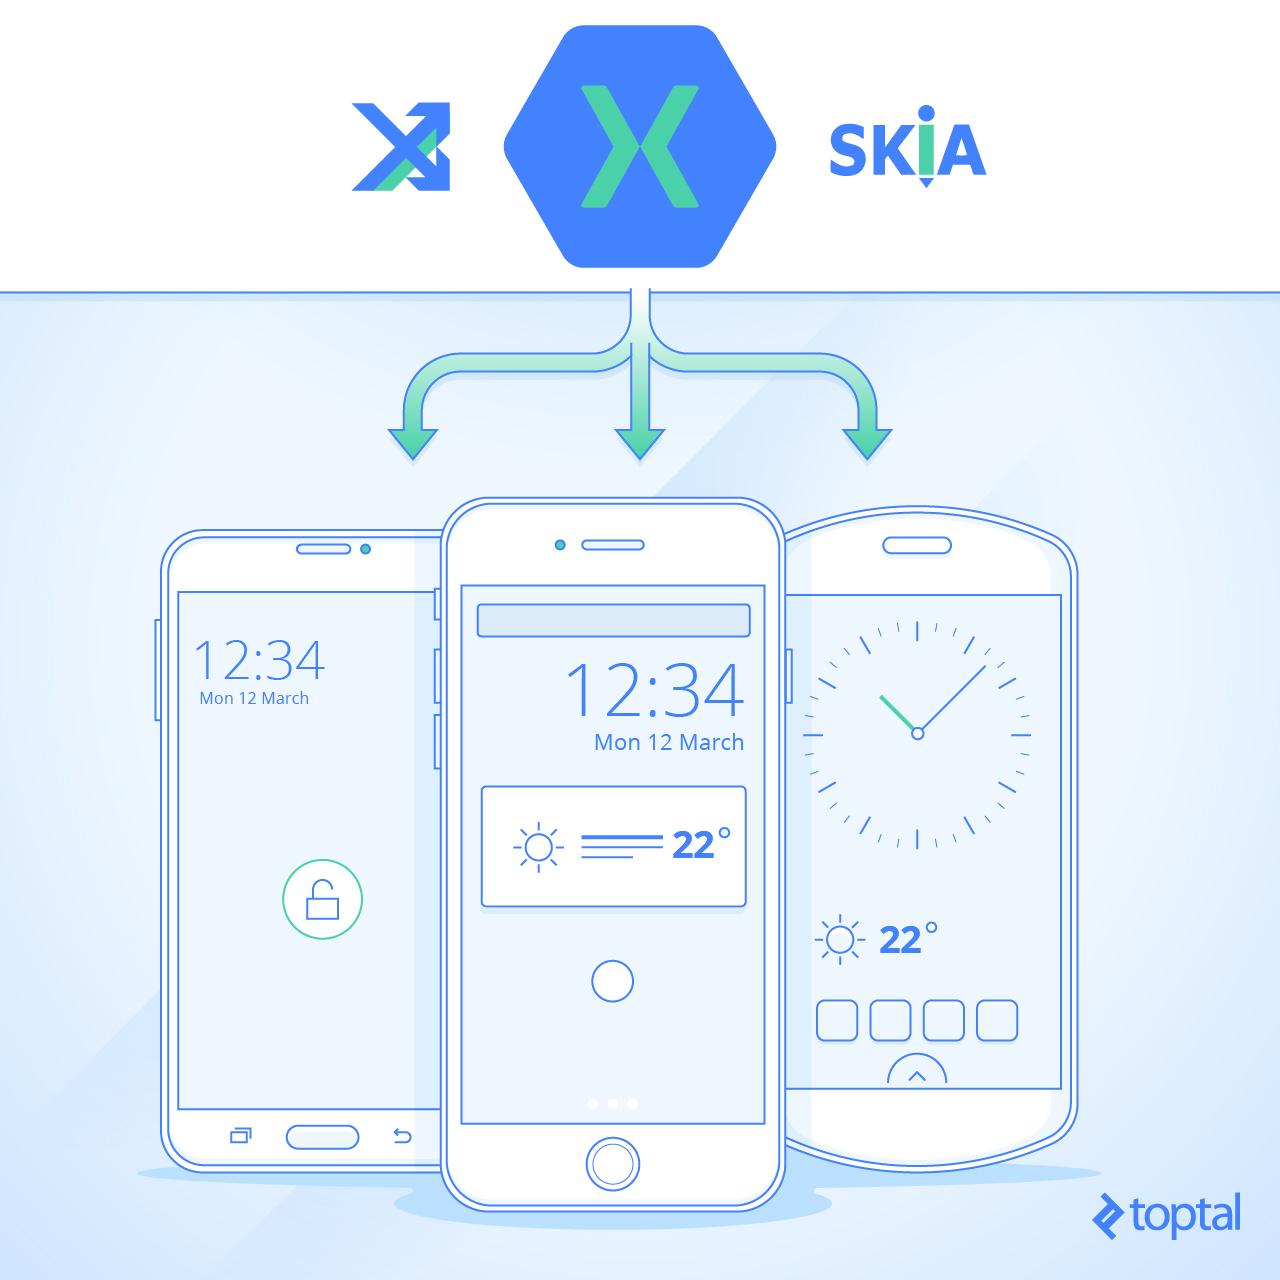 Cross-Platform App Development With Xamarin | Toptal